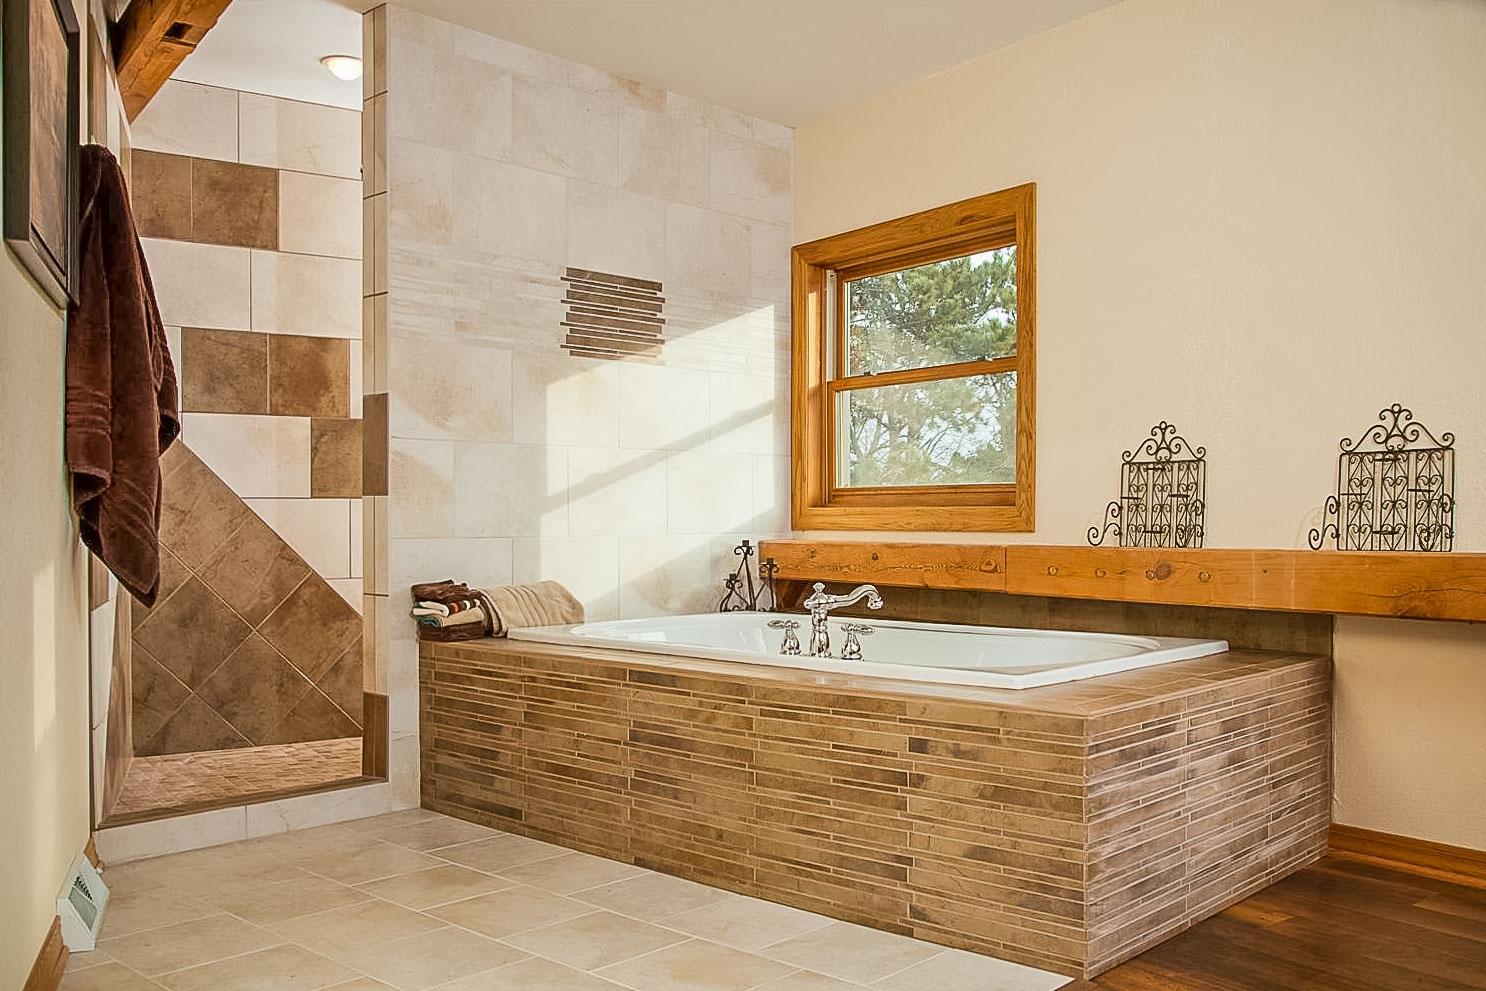 Timber Frame Master Bath -   WISCONSIN BUILDERS ASSOCIATION AWARD 2011